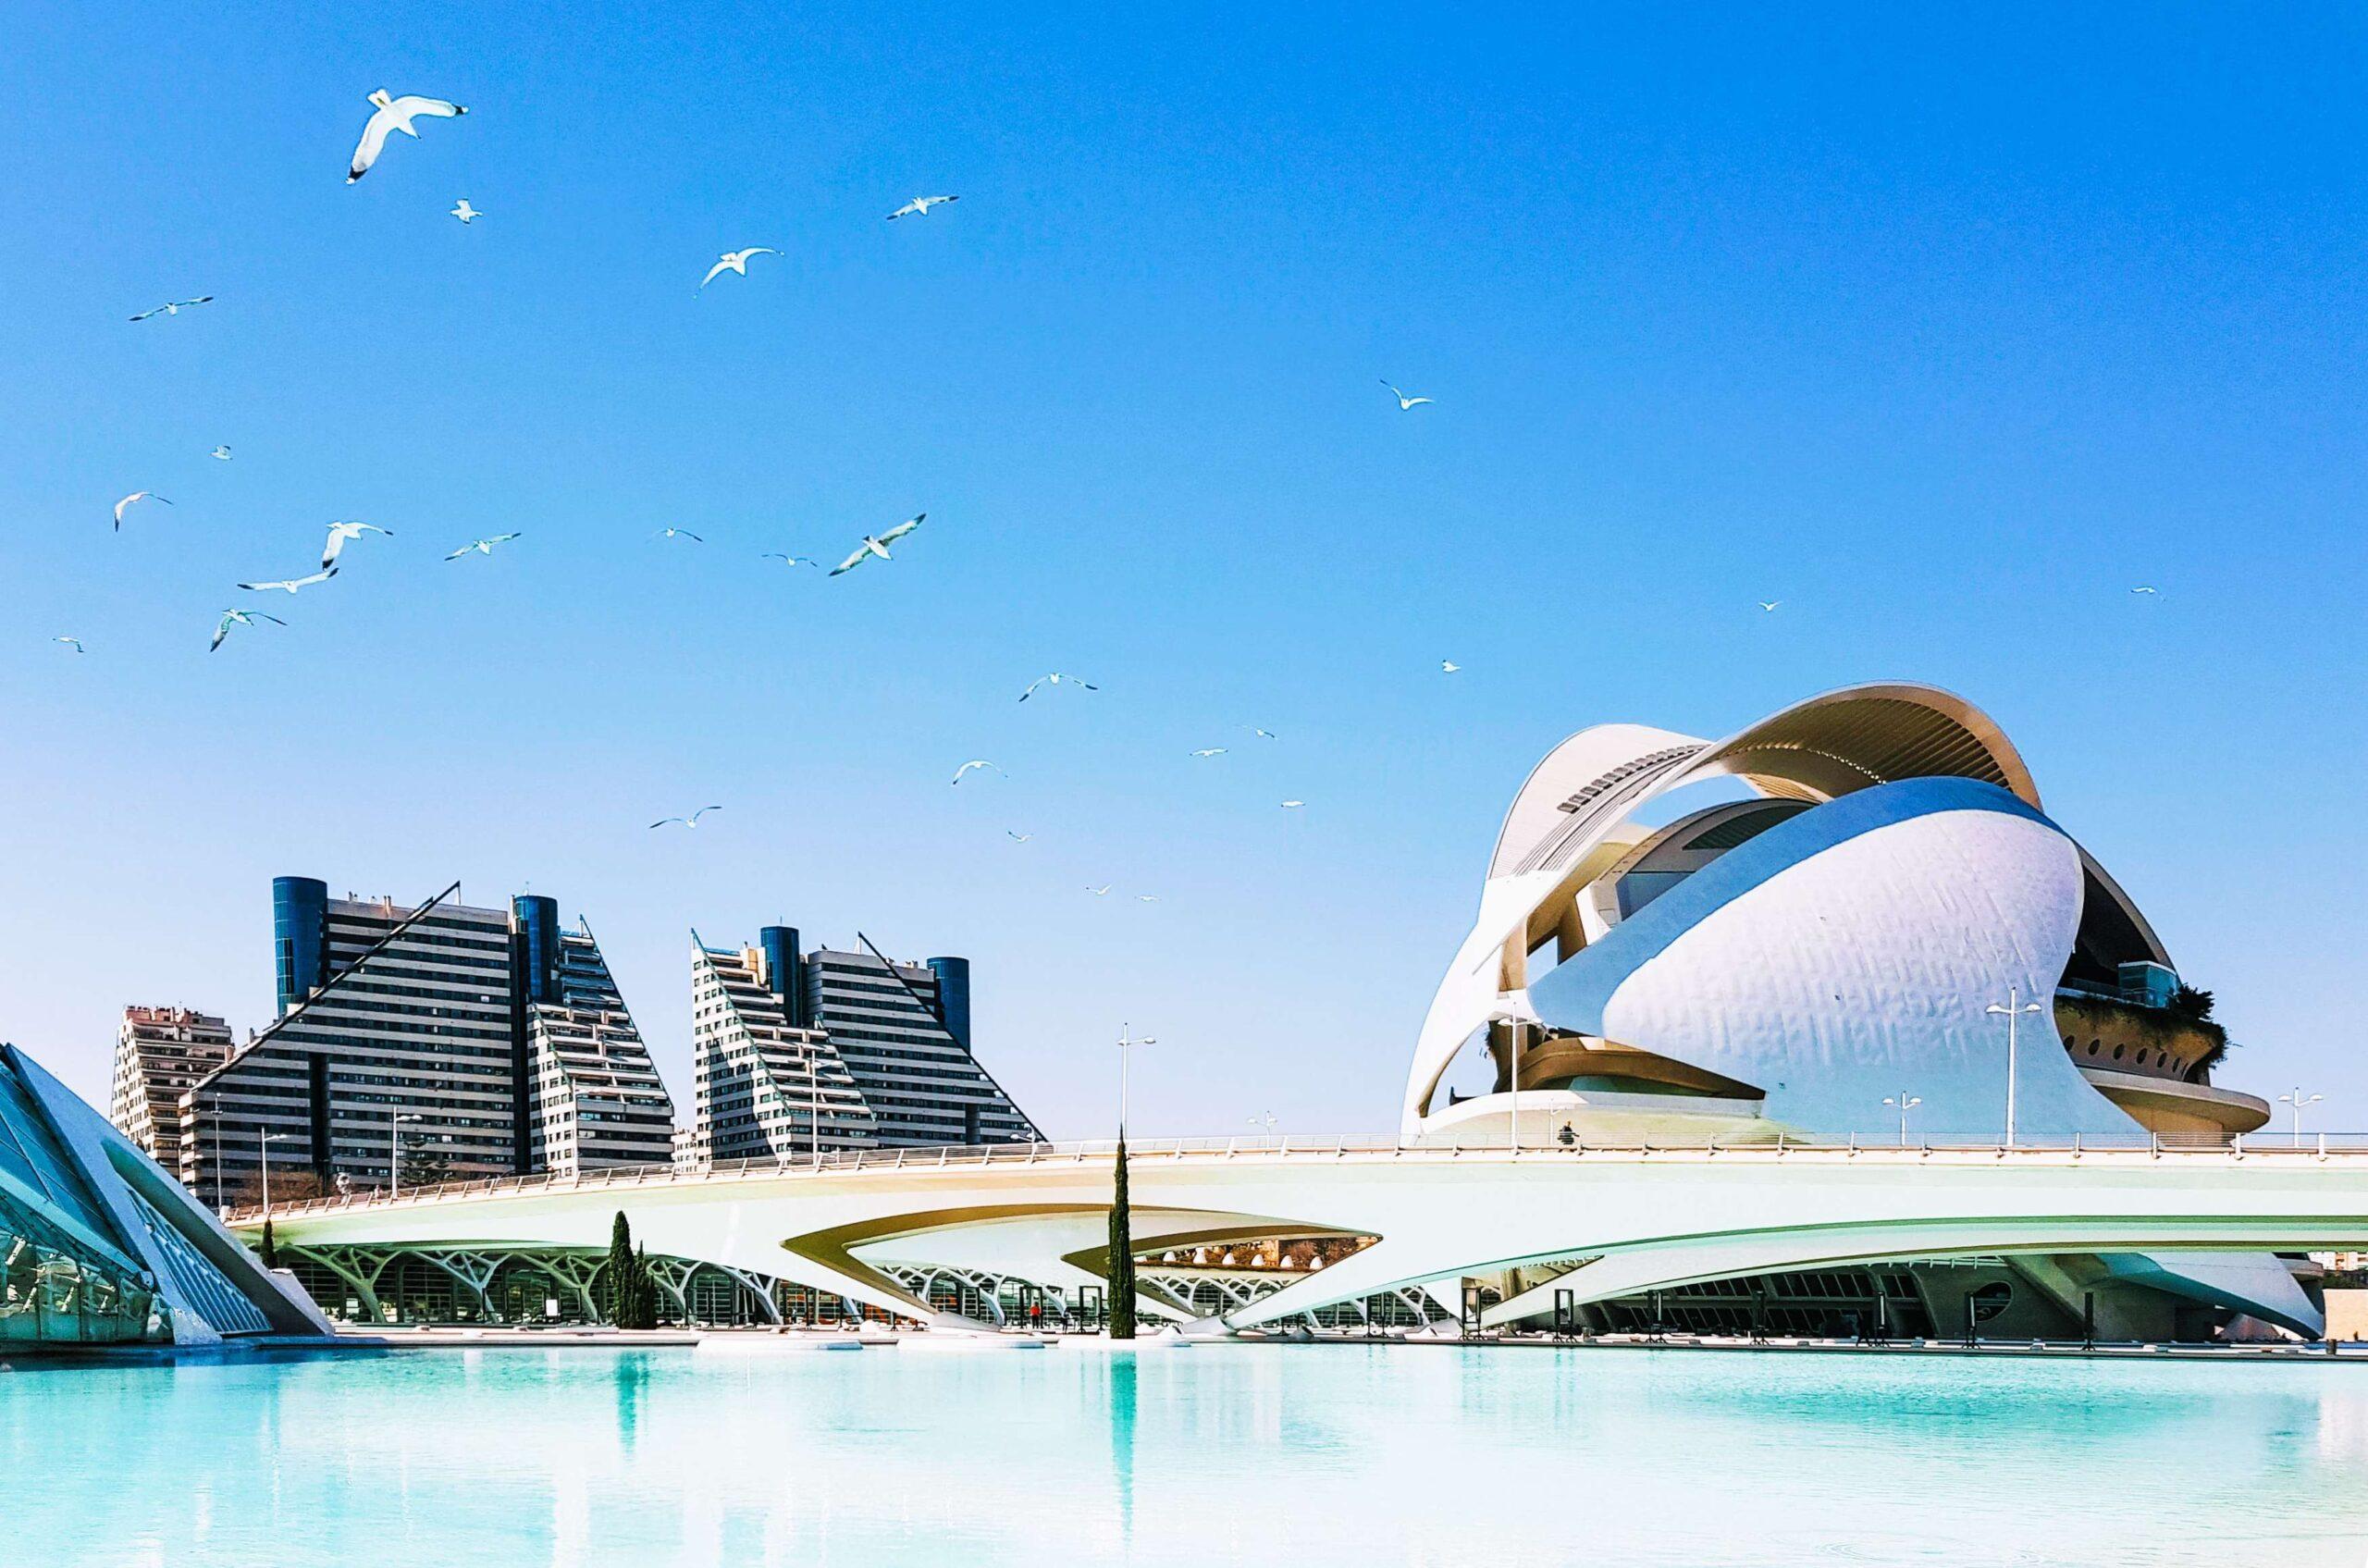 valencia, spain, travel, dekar's documents